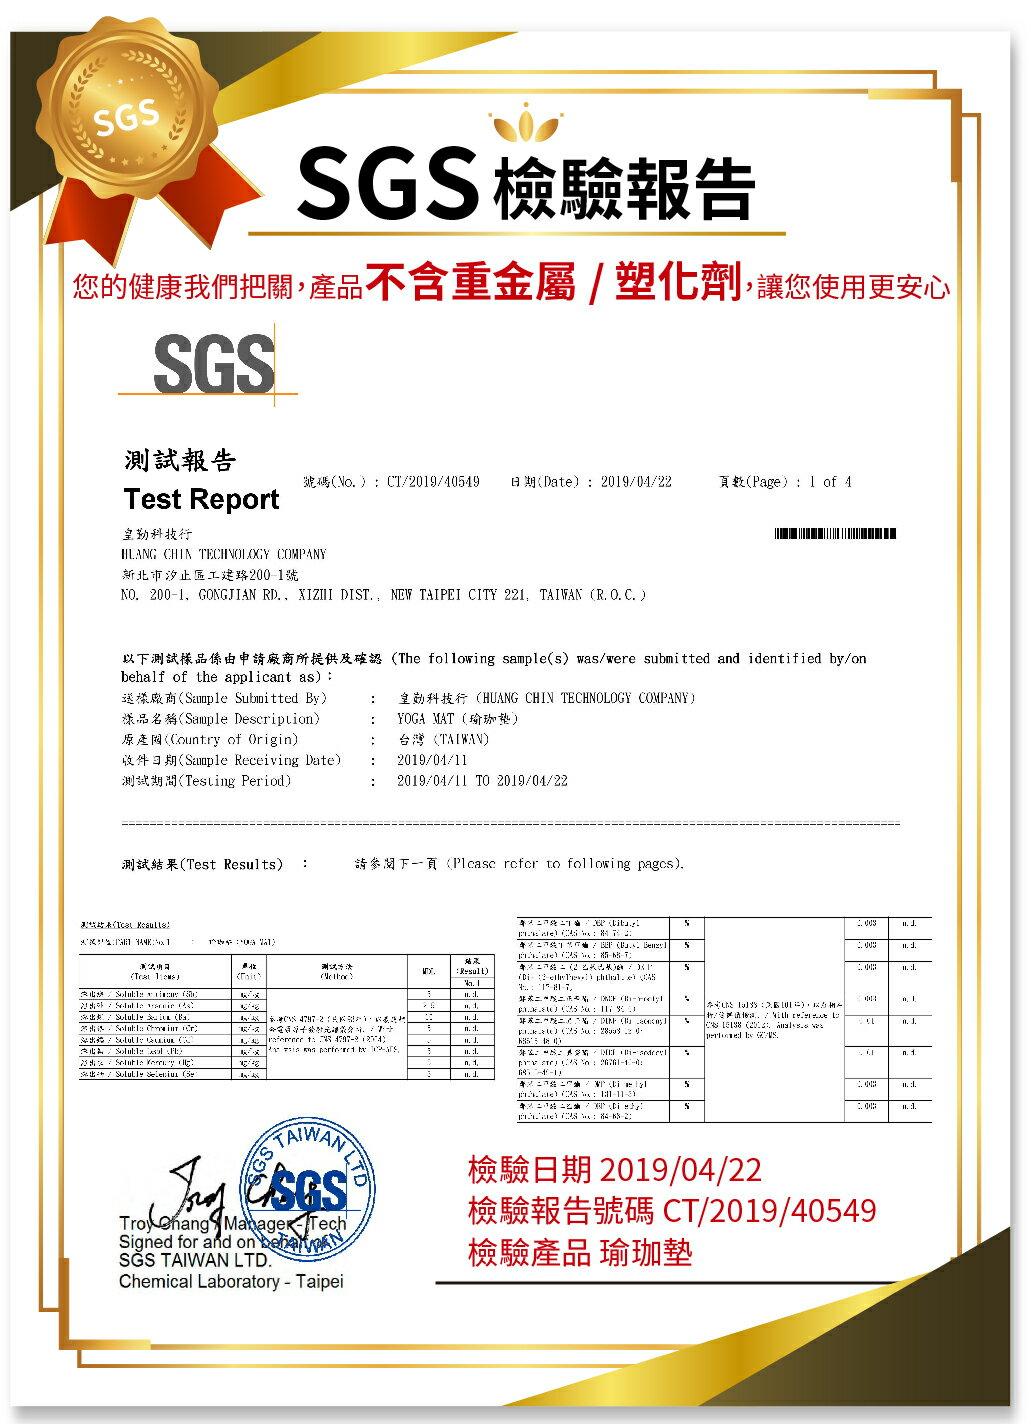 【Royal御皇居】 瑜珈墊 通過SGS認證 10mm超厚瑜珈墊 加厚瑜珈墊 NBR瑜珈墊 瑜伽墊 瑜珈軟墊【I0132】